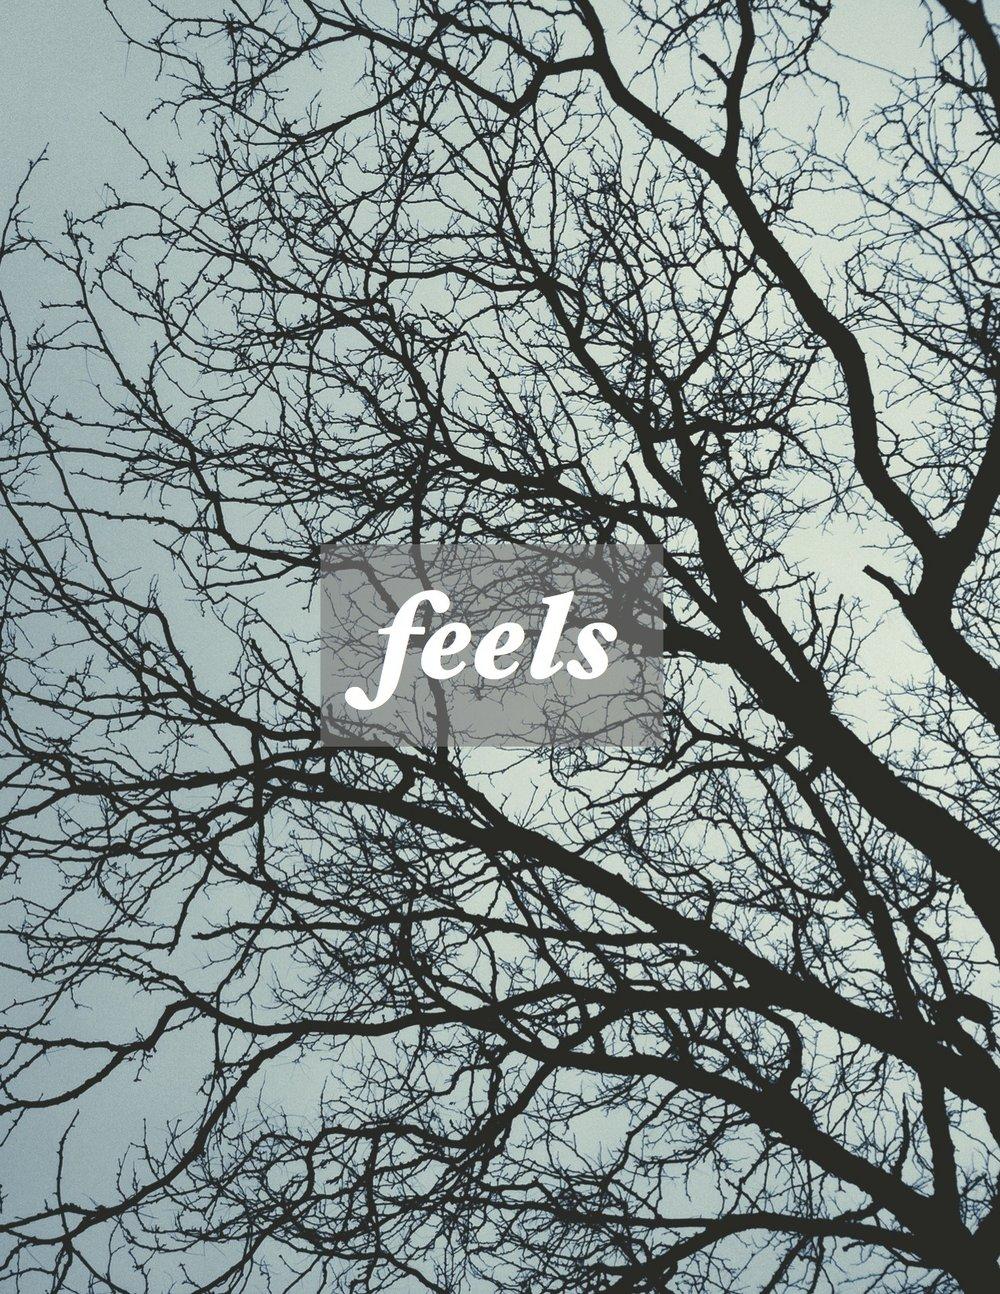 feels - Healing, self-love, interconnectivity.